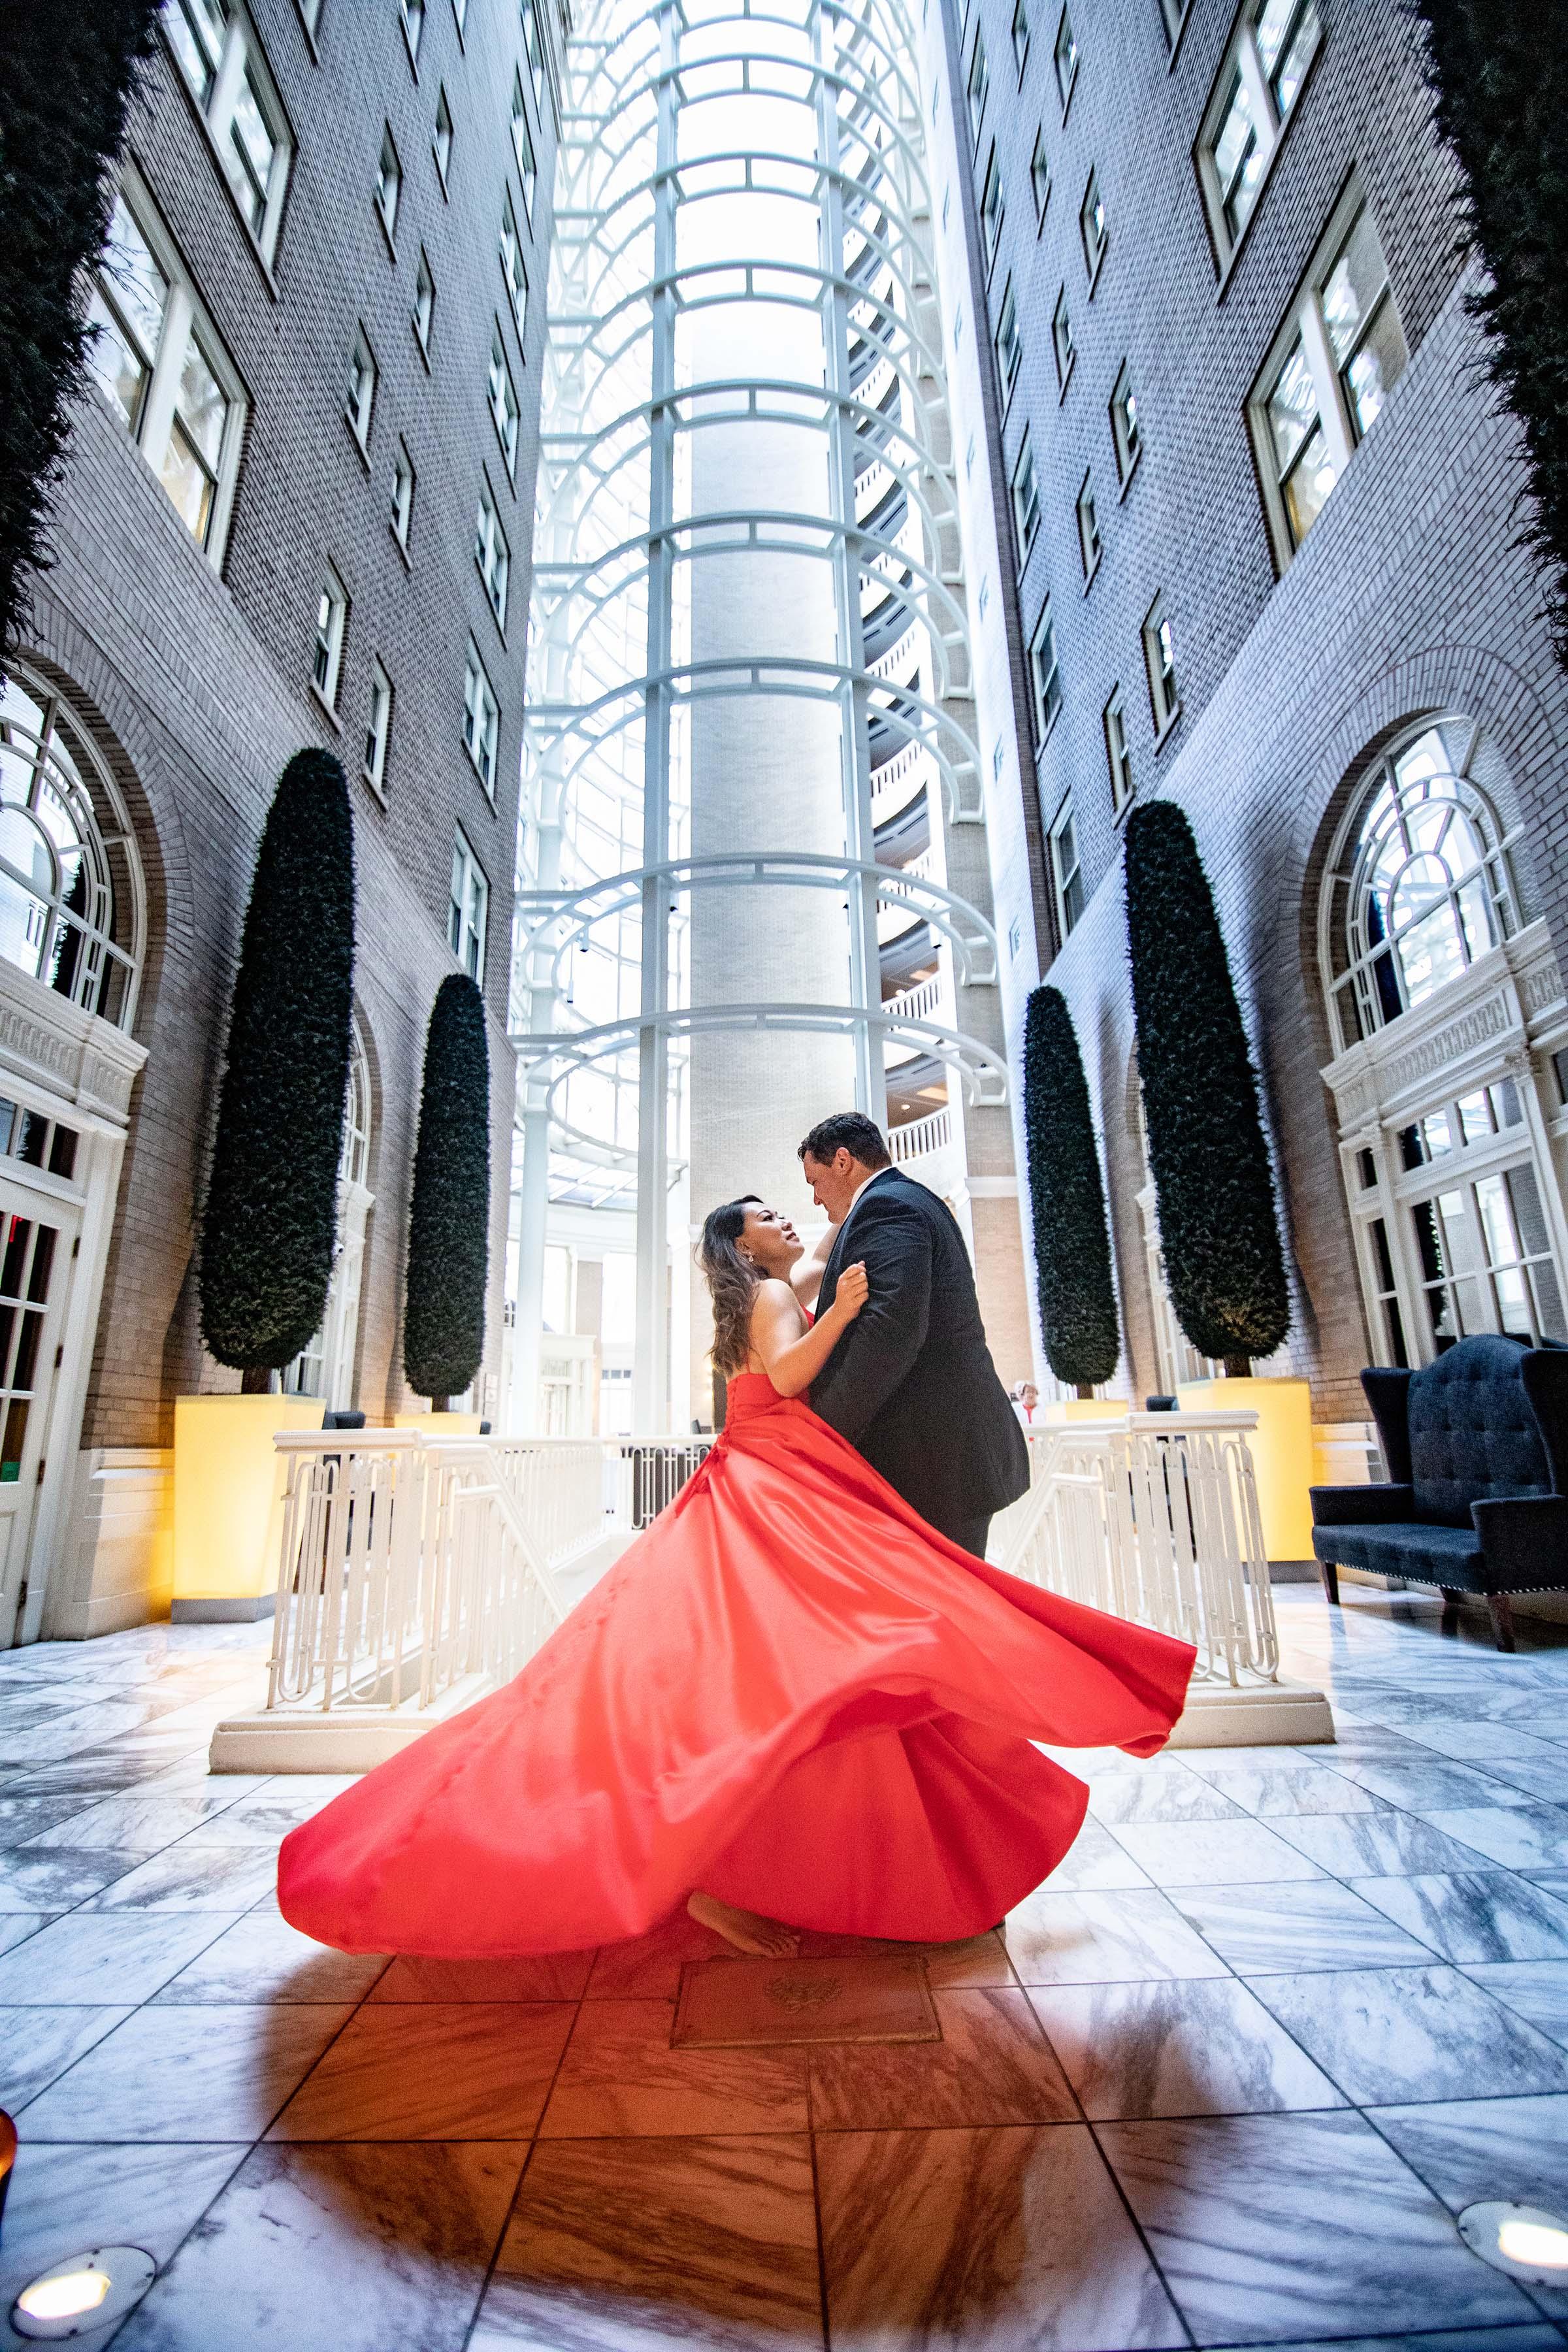 The Historic and elegant Georgian Terrace Atrium located at the corner of Ponce de Leon and Peachtree Street captured by the Atlanta wedding photographers at ww.AtlantaAritsicWeddings.com